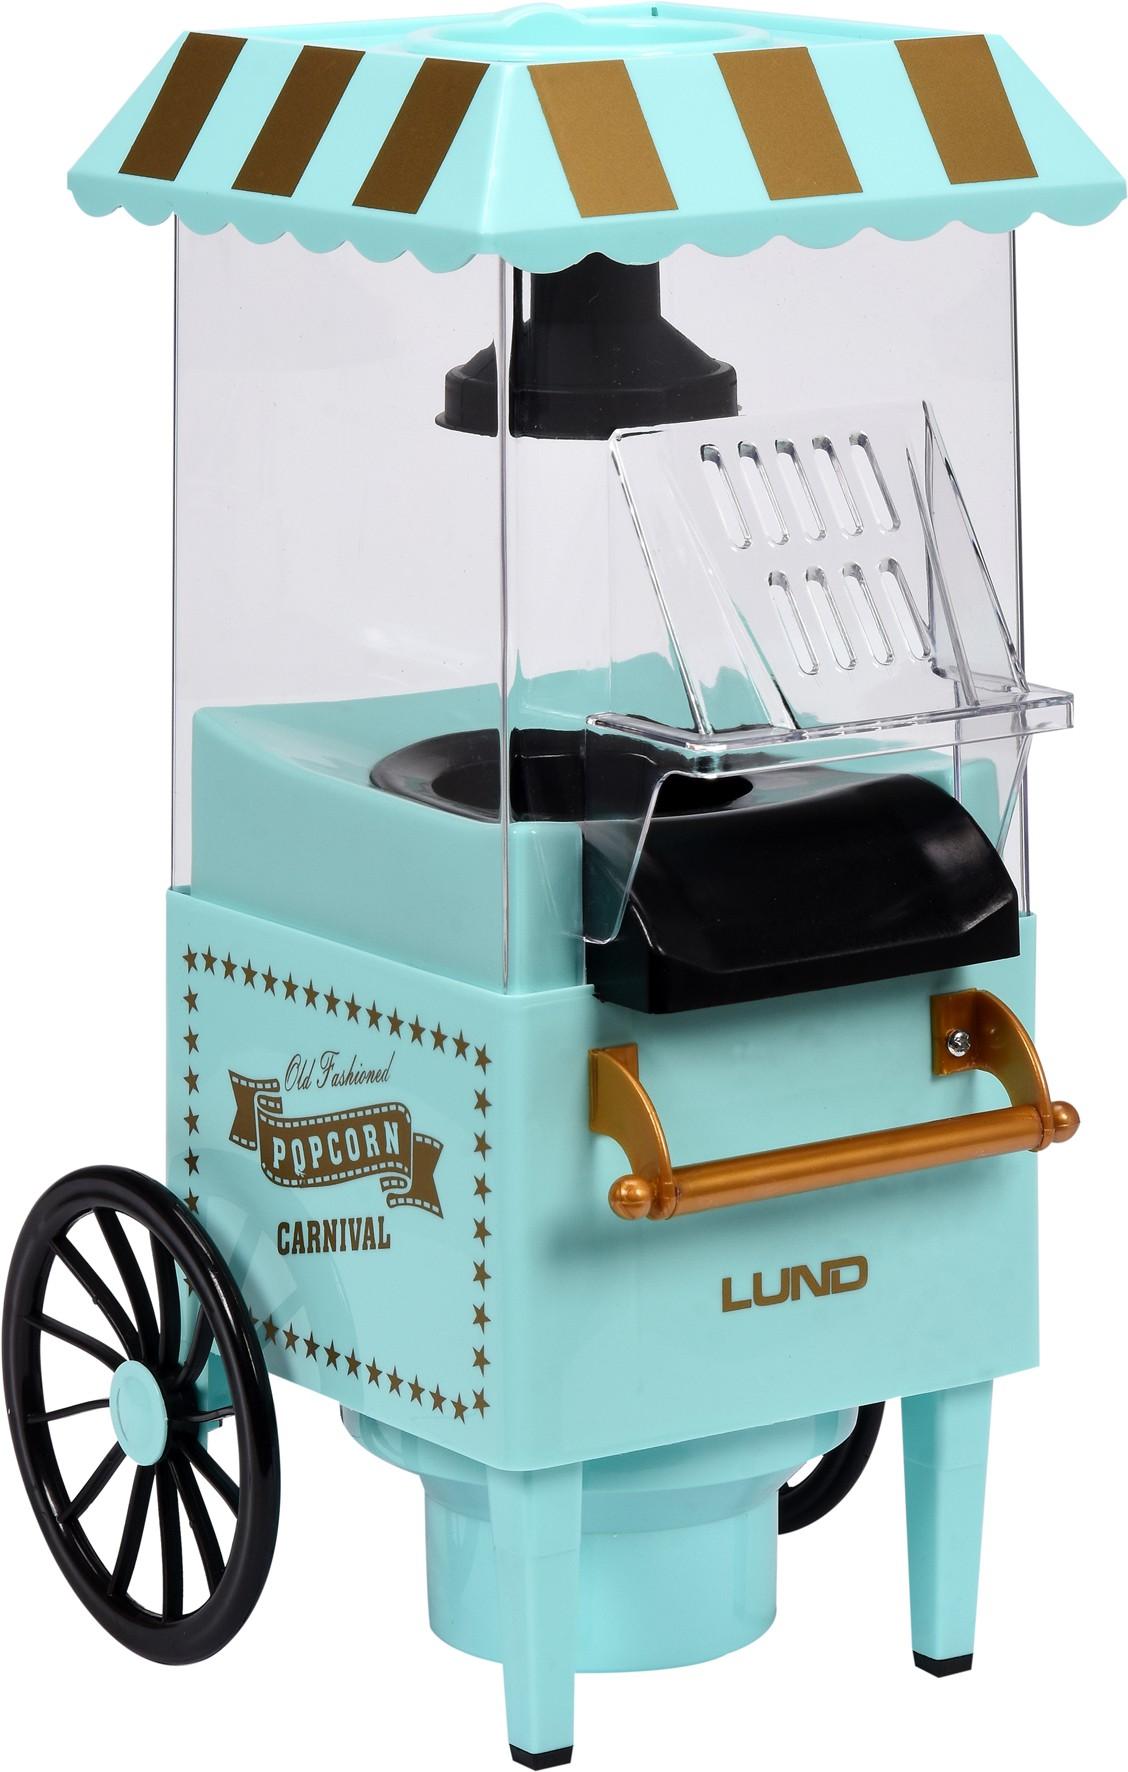 Stroj na popcorn - vozík 1200W